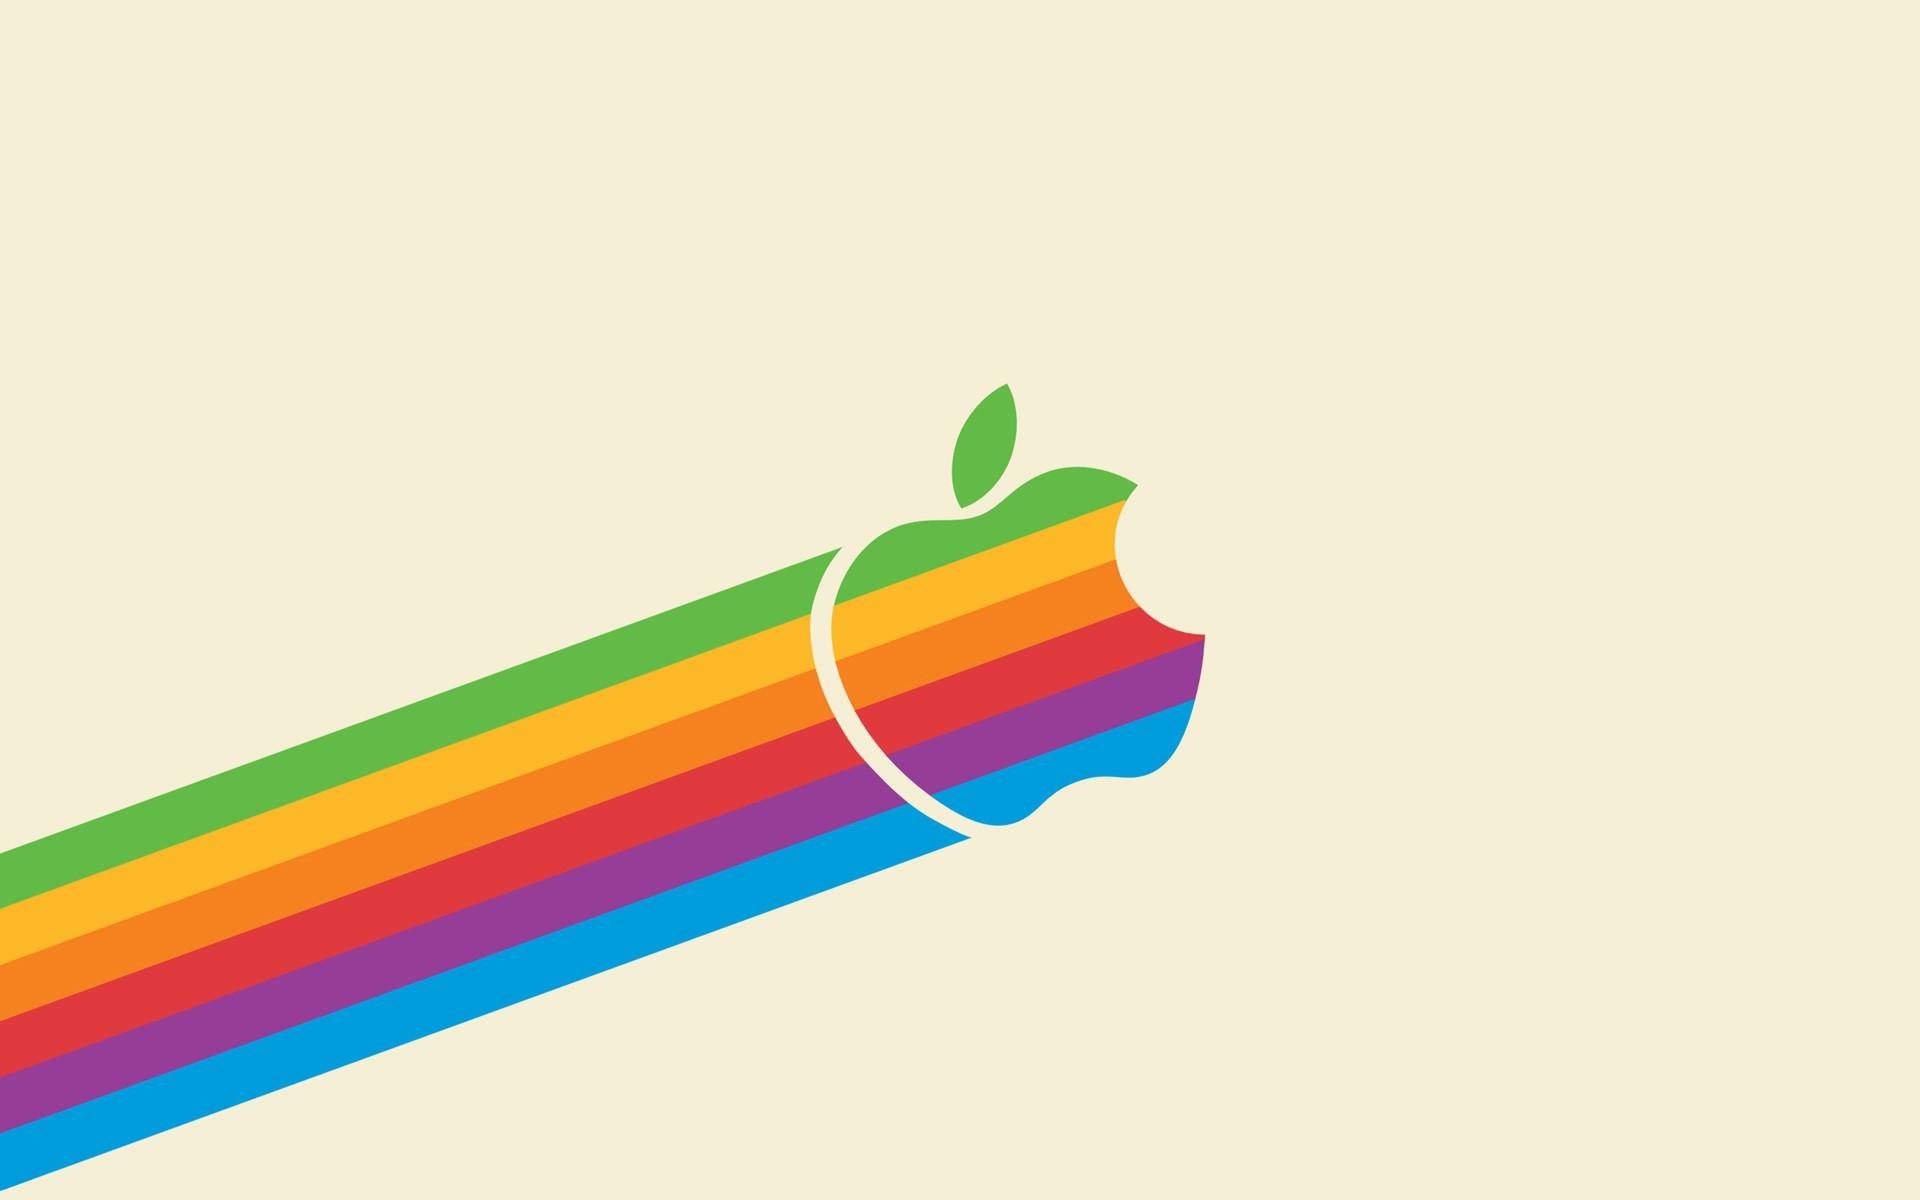 General 1920x1200 Apple Inc. simple background minimalism